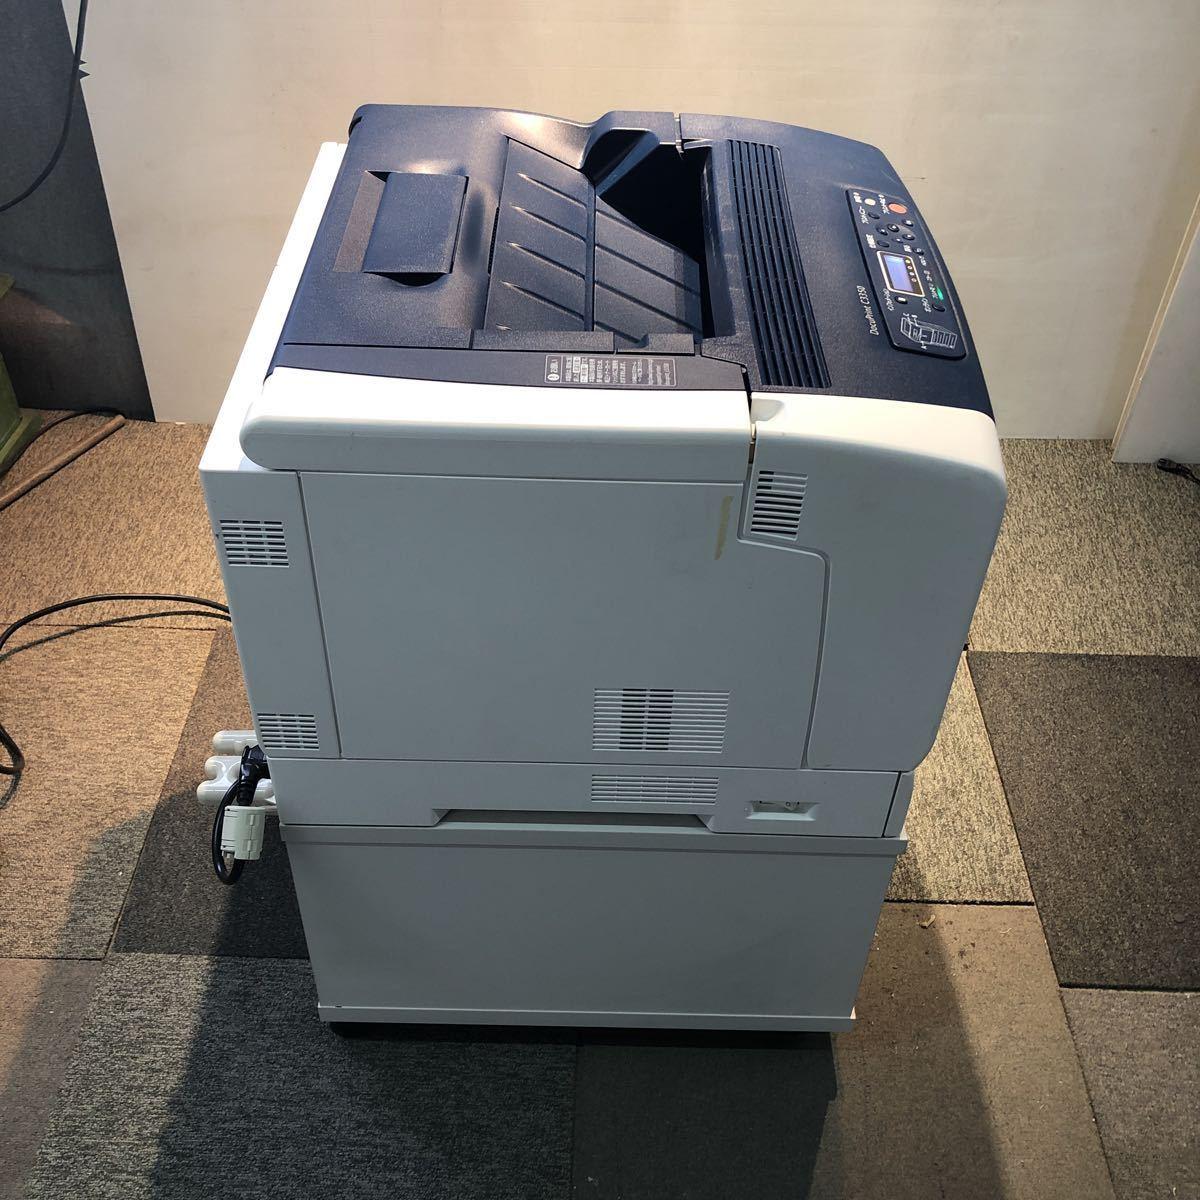 FUJI XEROX 富士ゼロックス A3 カラーレーザー DocuPrint C3350 2段給紙 両面印刷 専用キャスタ台 プリンター コピー機 ファックス_画像4